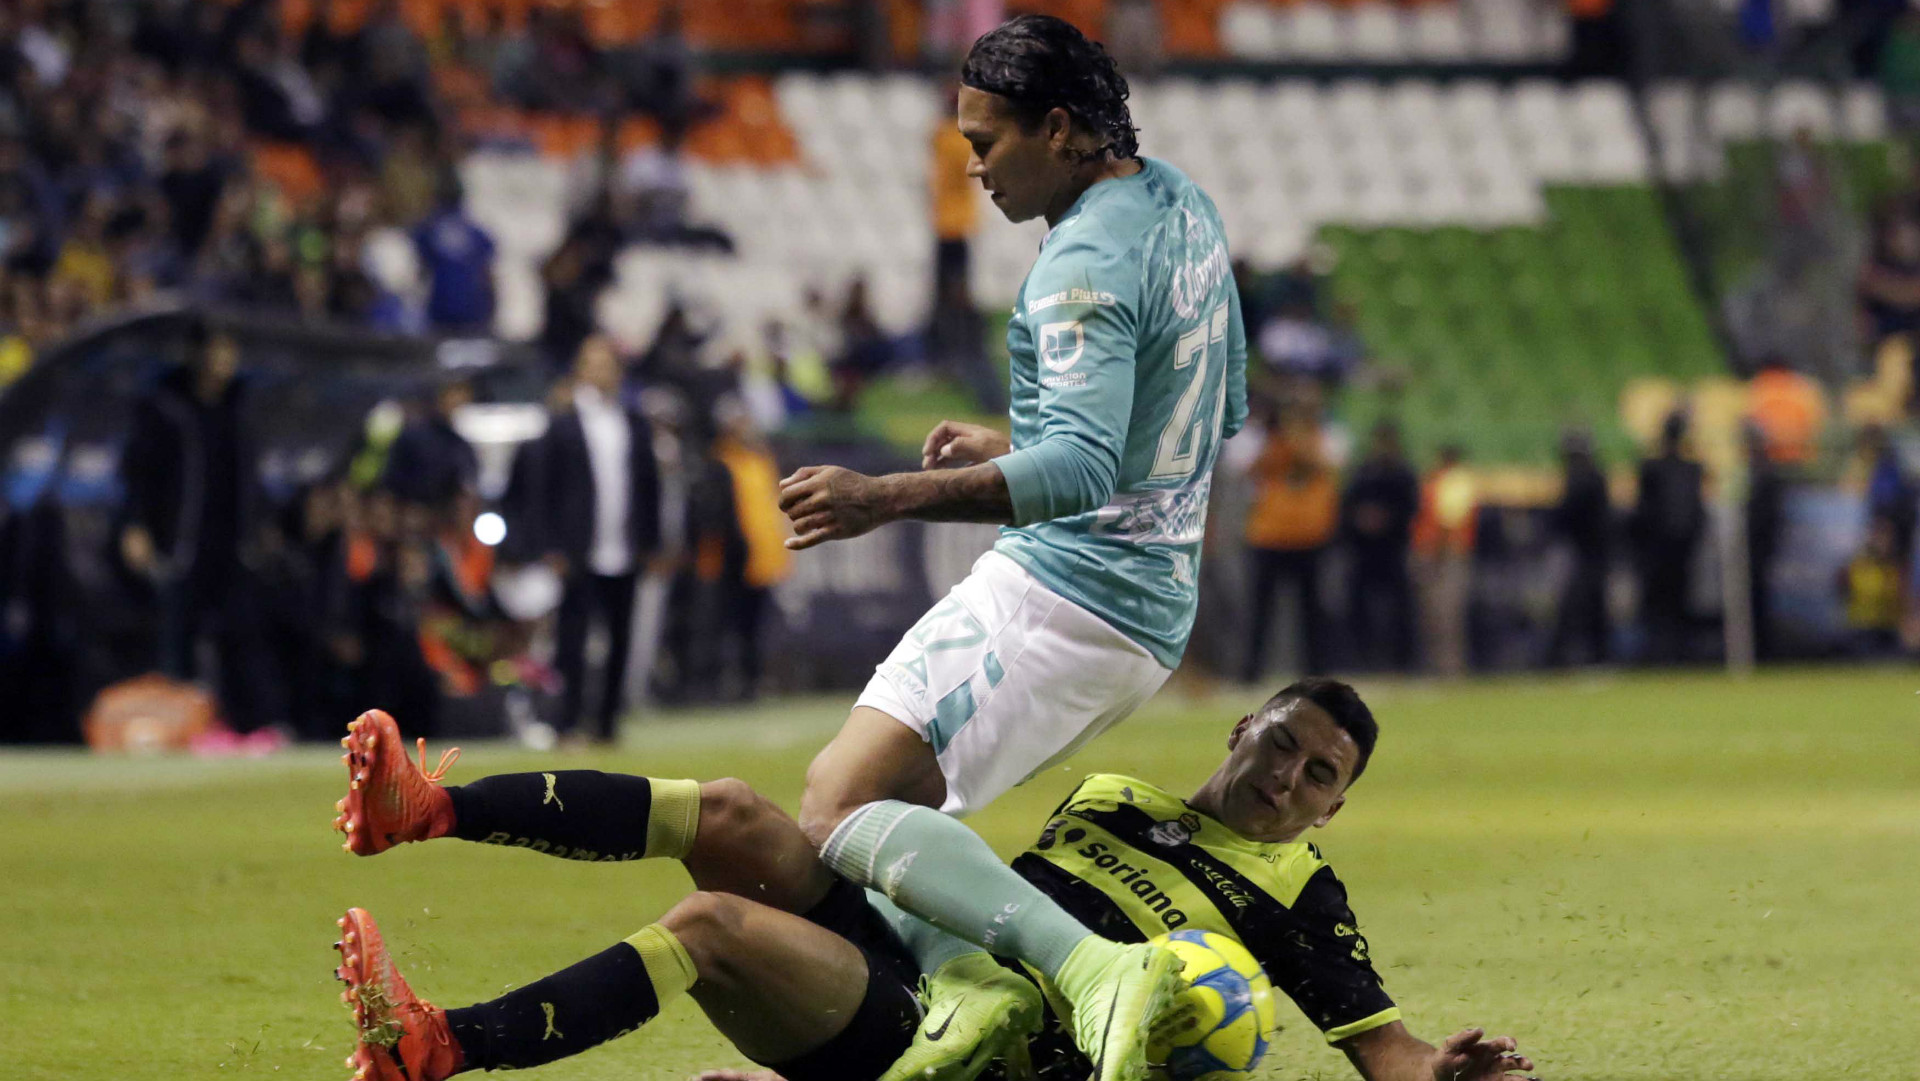 Jorge Sanchez Santos Laguna Carlos Gullit Pena Leon